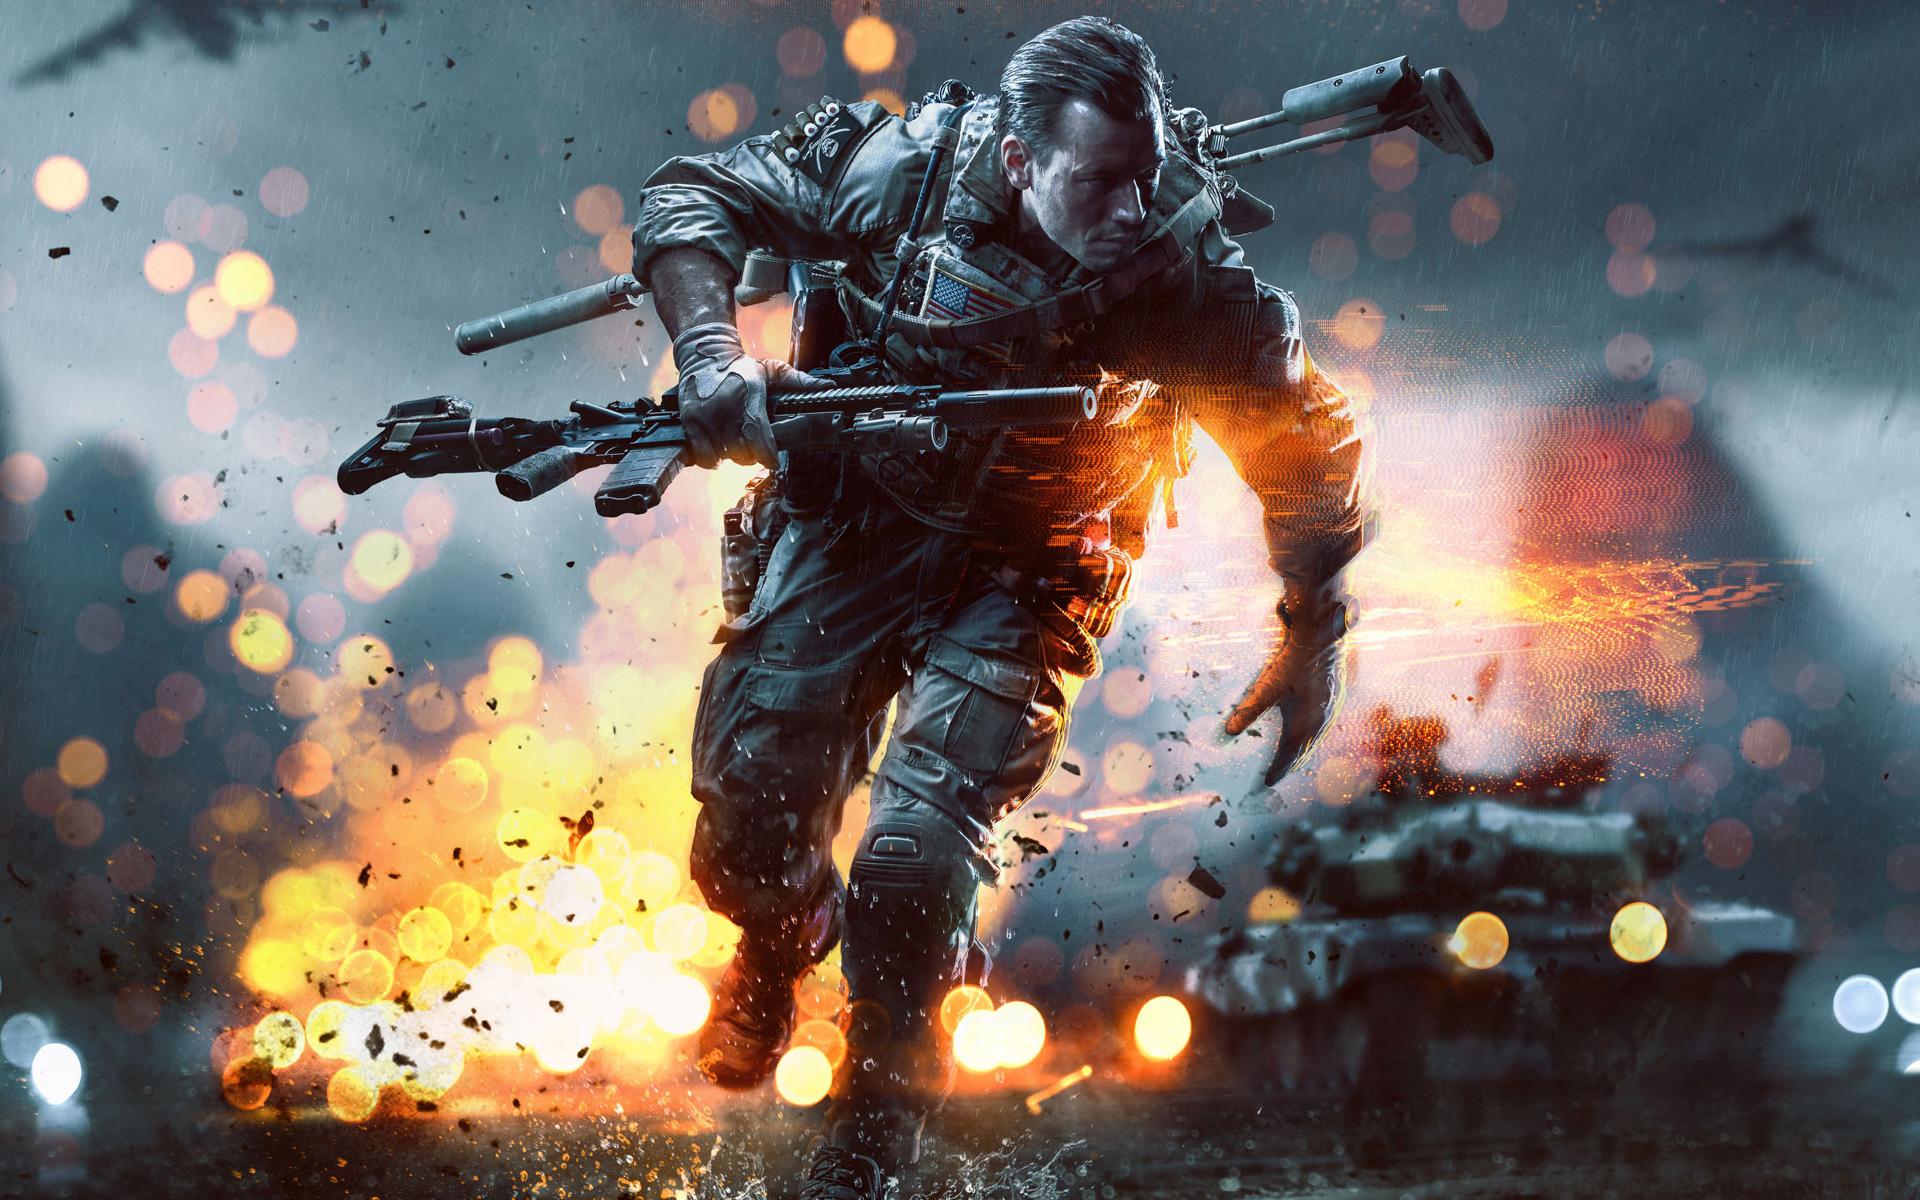 Battlefield 4 1080p Wallpaper - WallpaperSafari